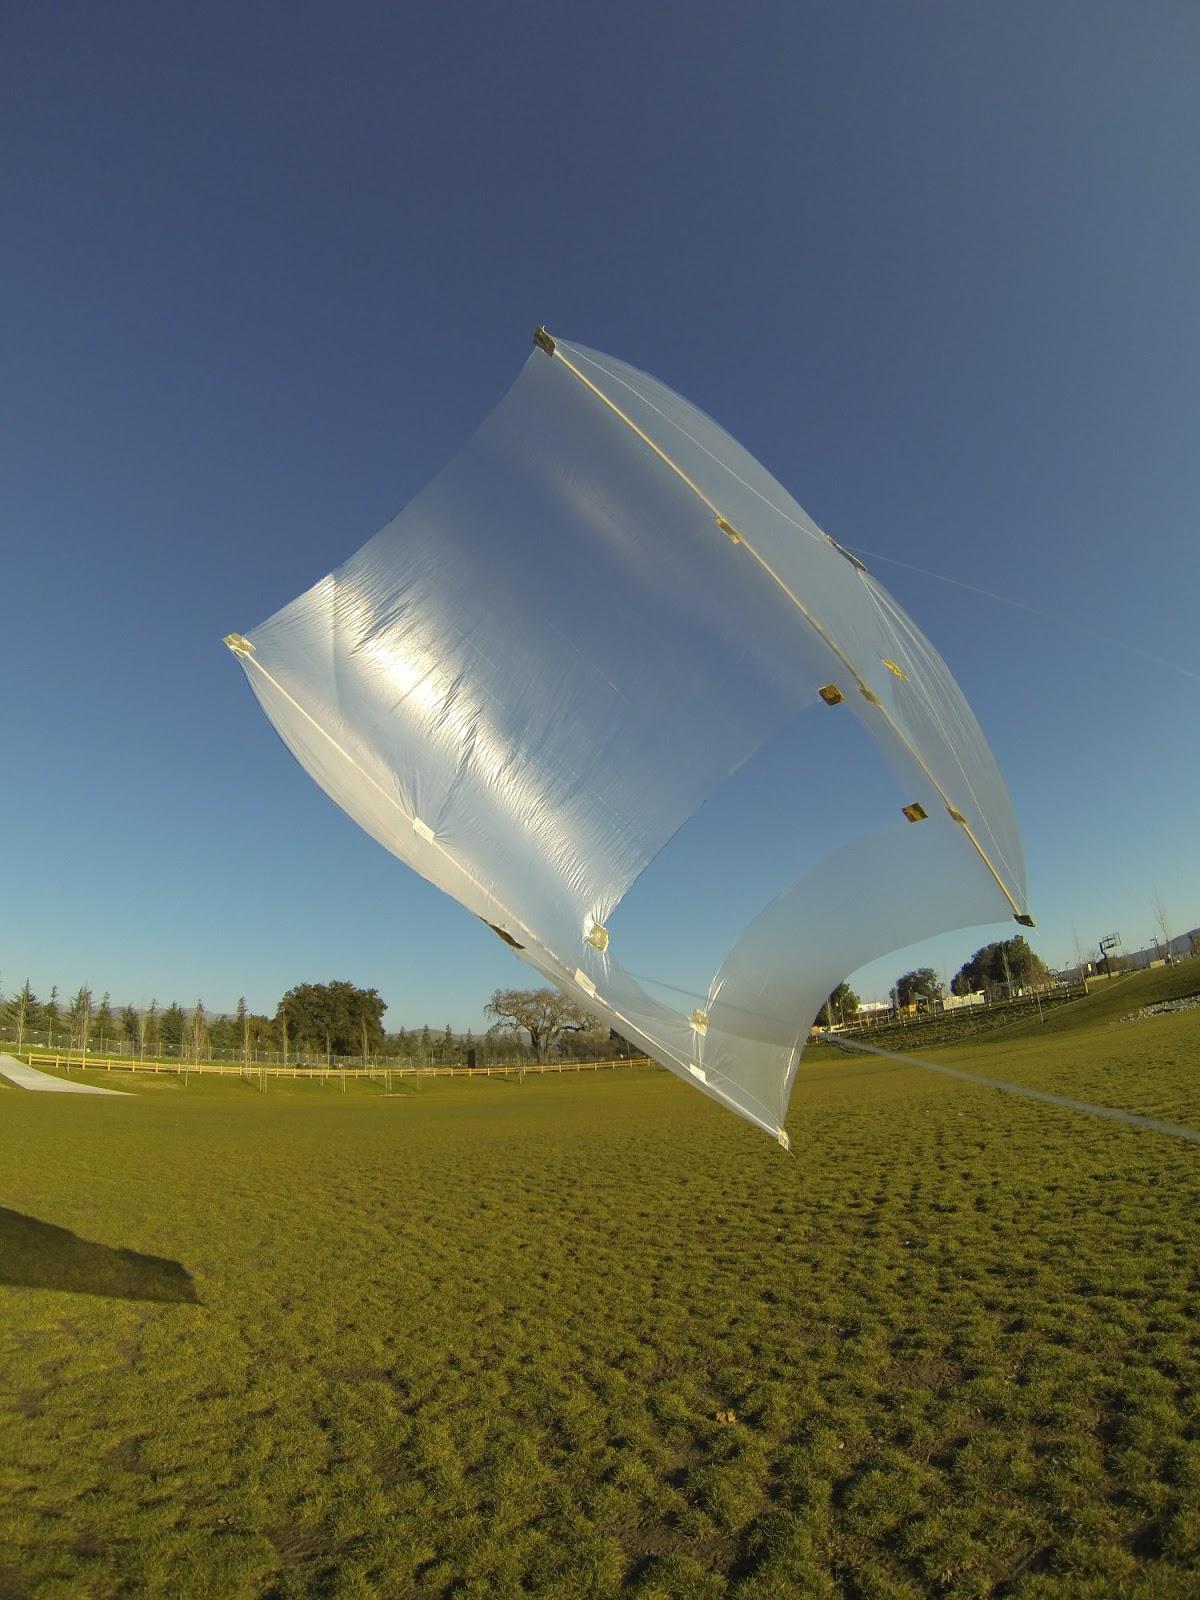 The flimsy kite.